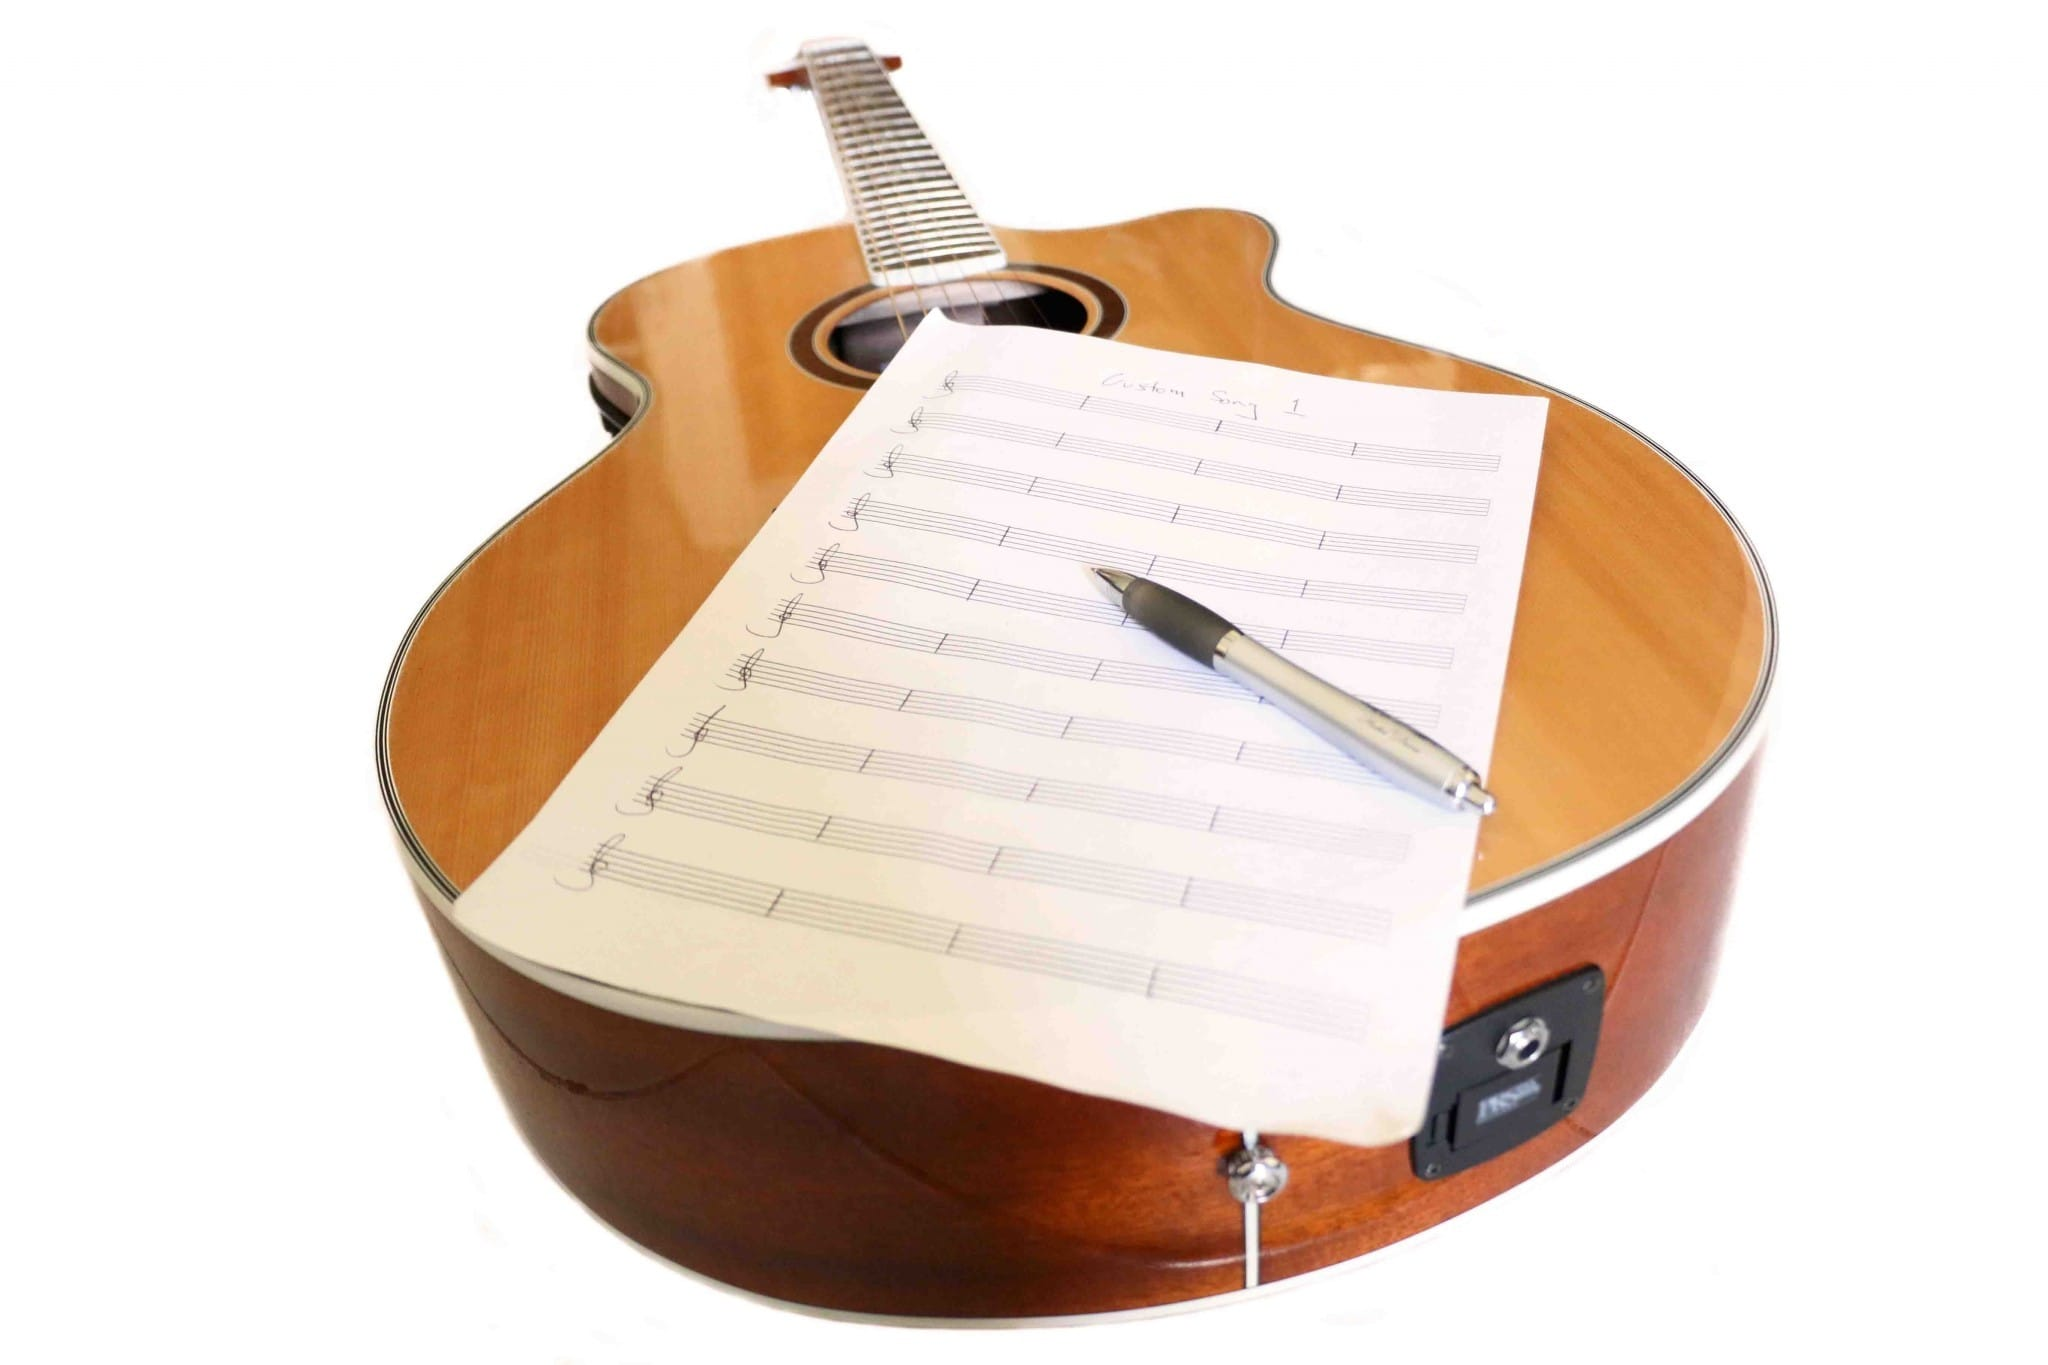 Write a custom song